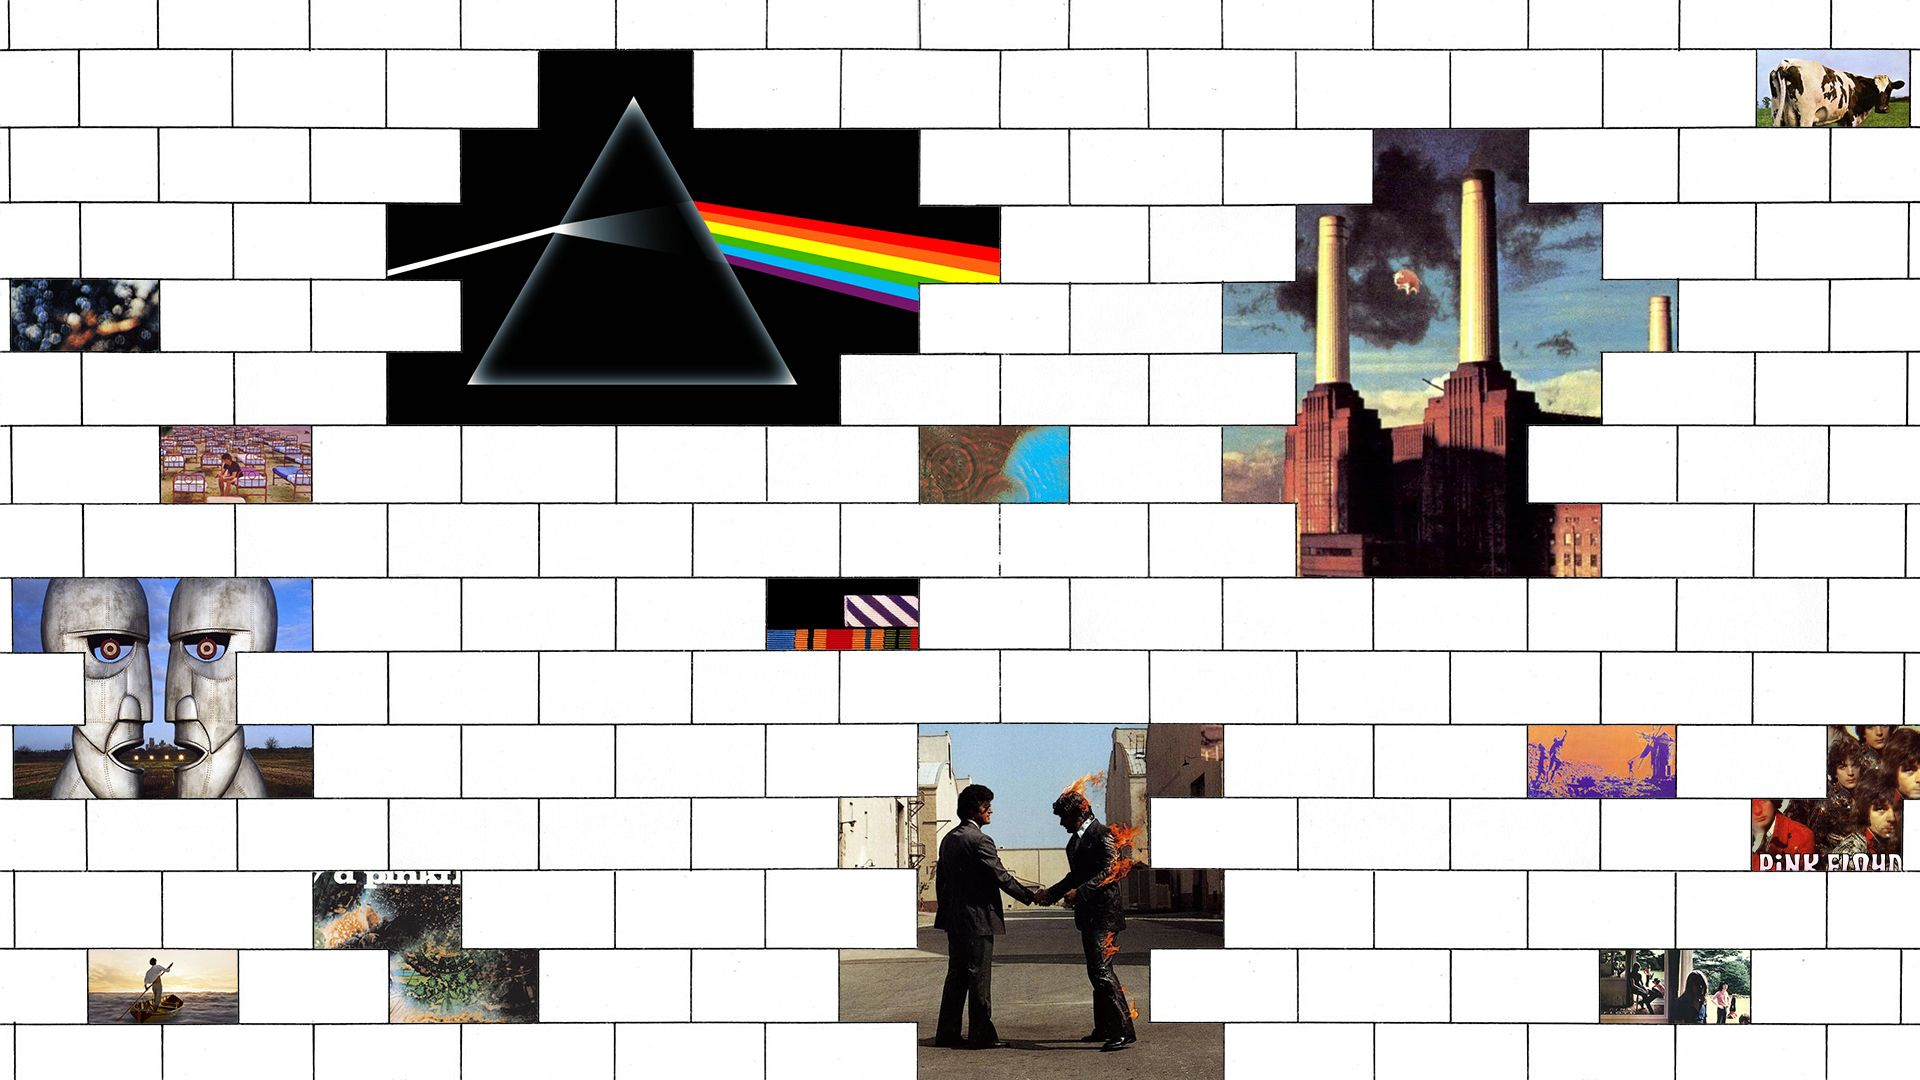 Self Made Pink Floyd Wallpaper 1920x1080 Top Reddit Wallpapers